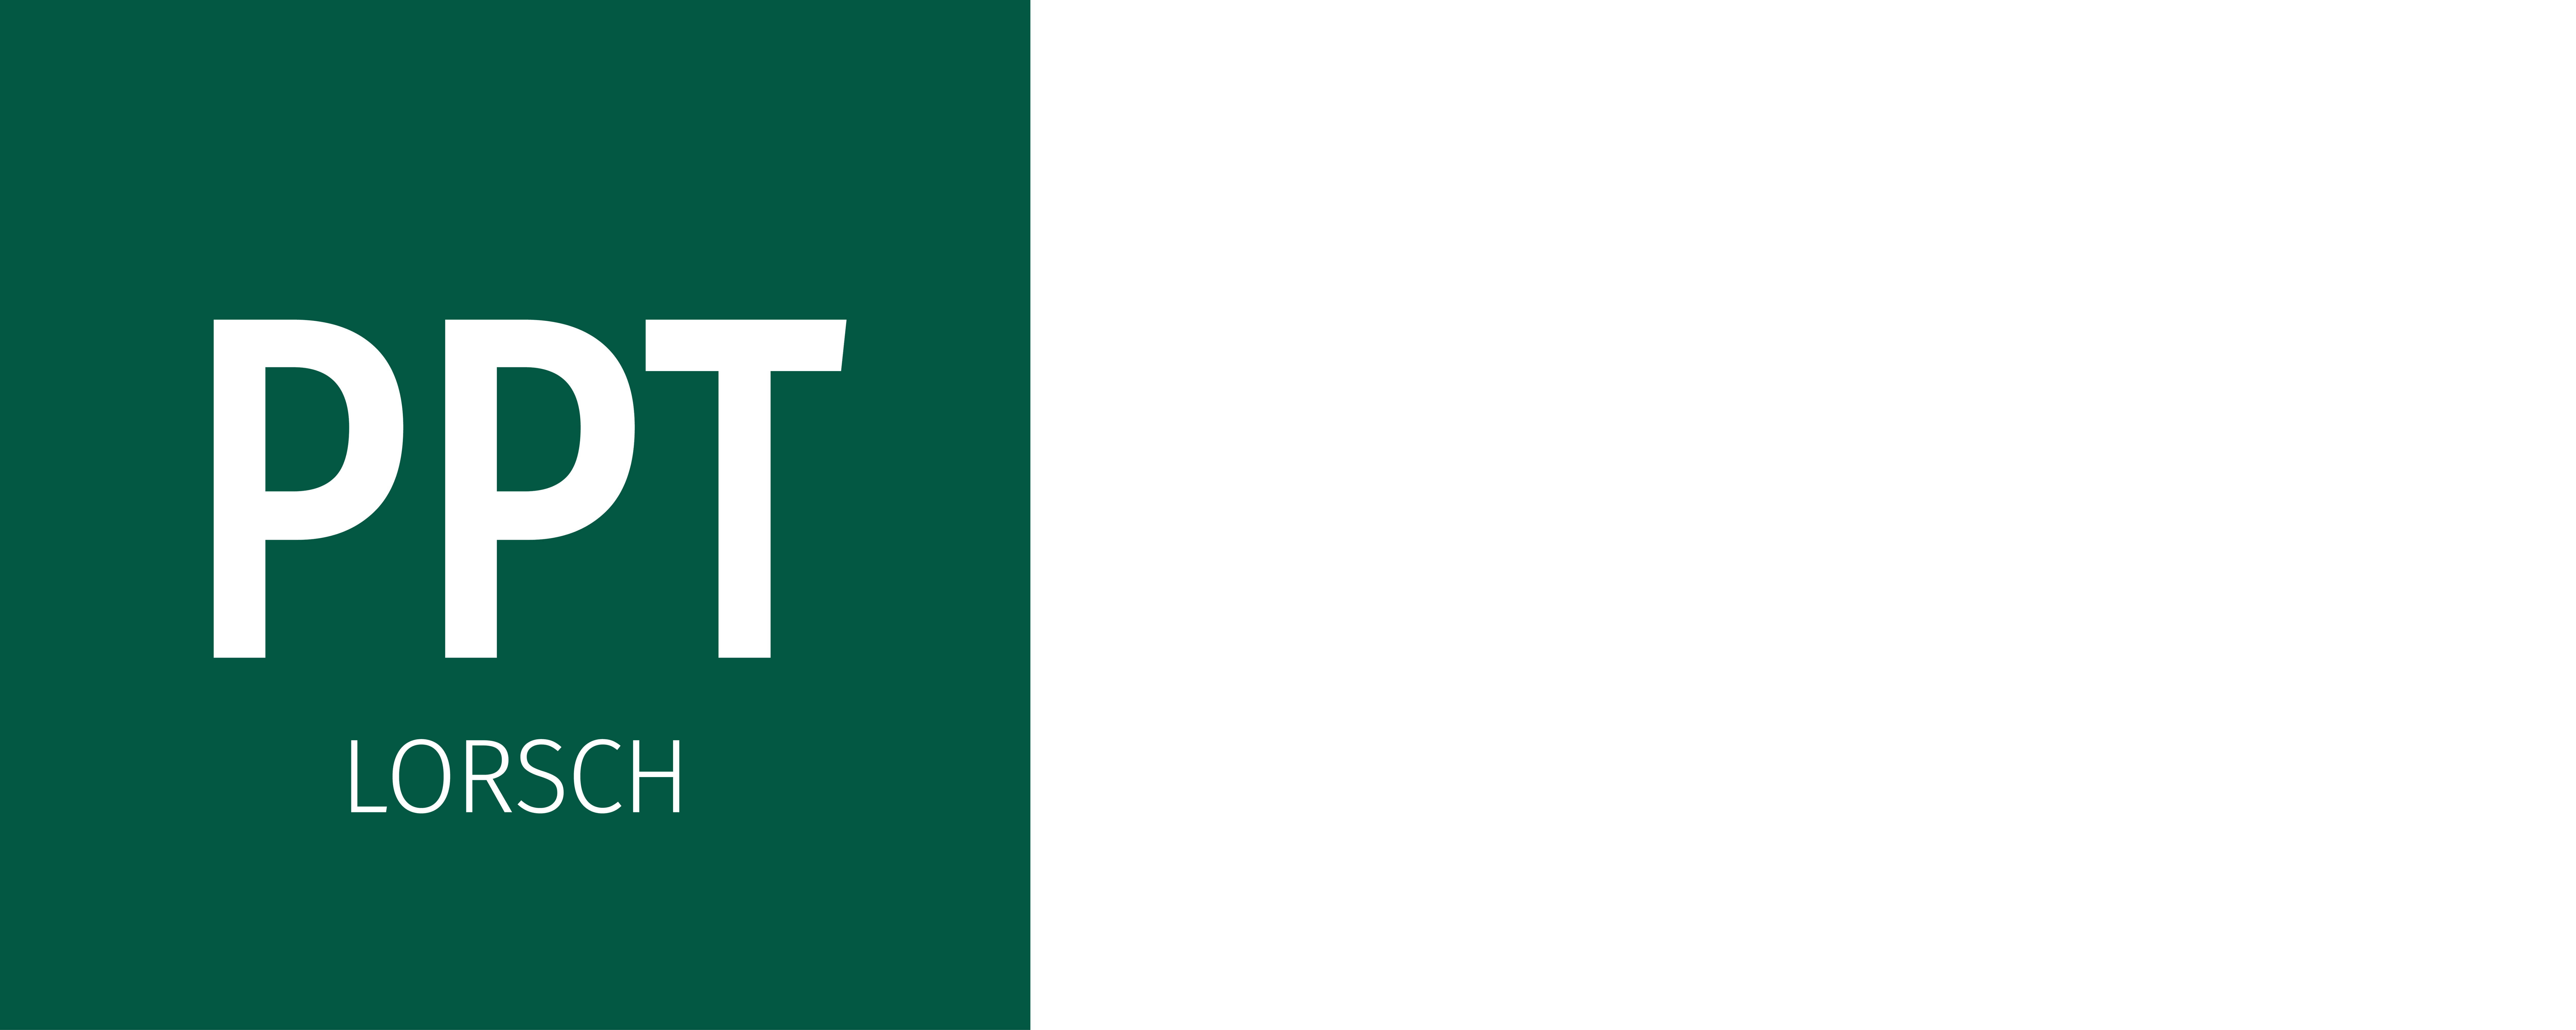 Prime Physiotherapie Lorsch